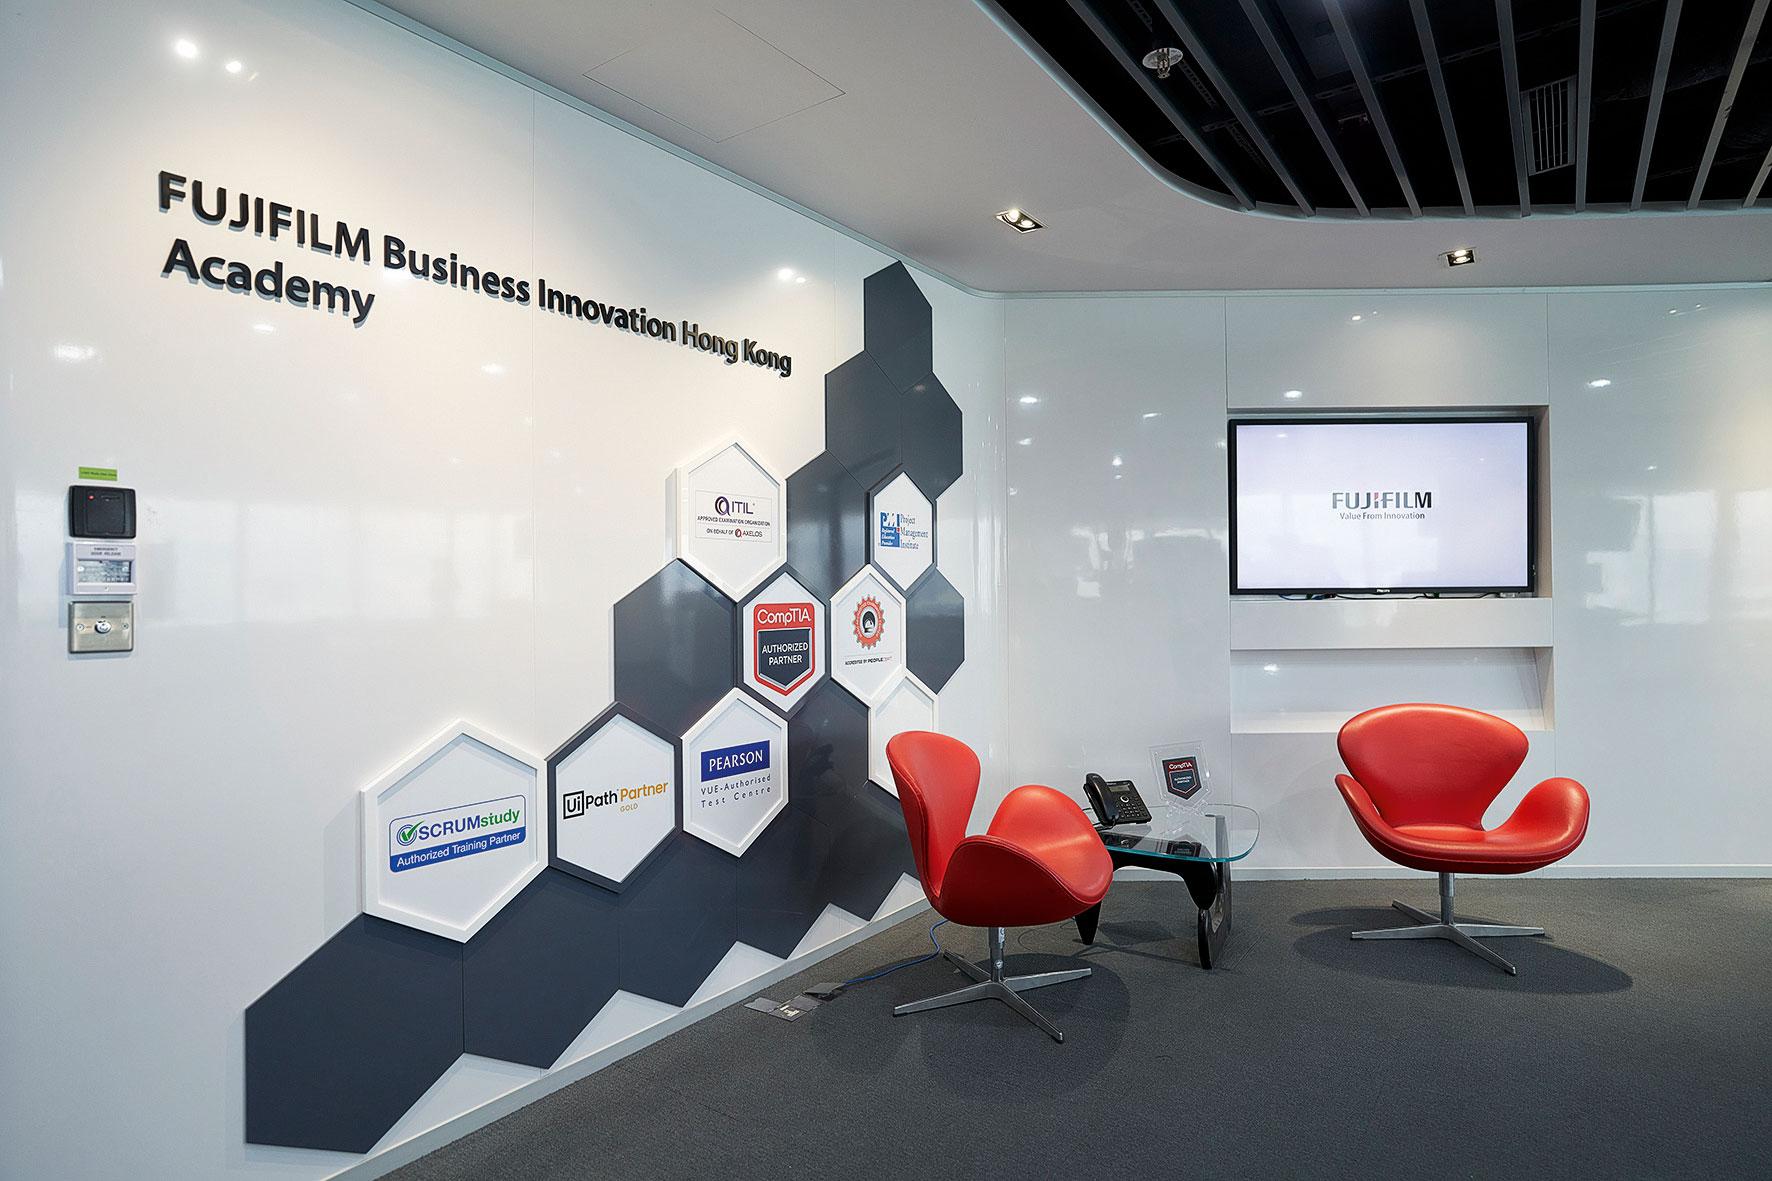 FUJIFILM BI HK學院會為員工提供有關產品和資訊科技的培訓。